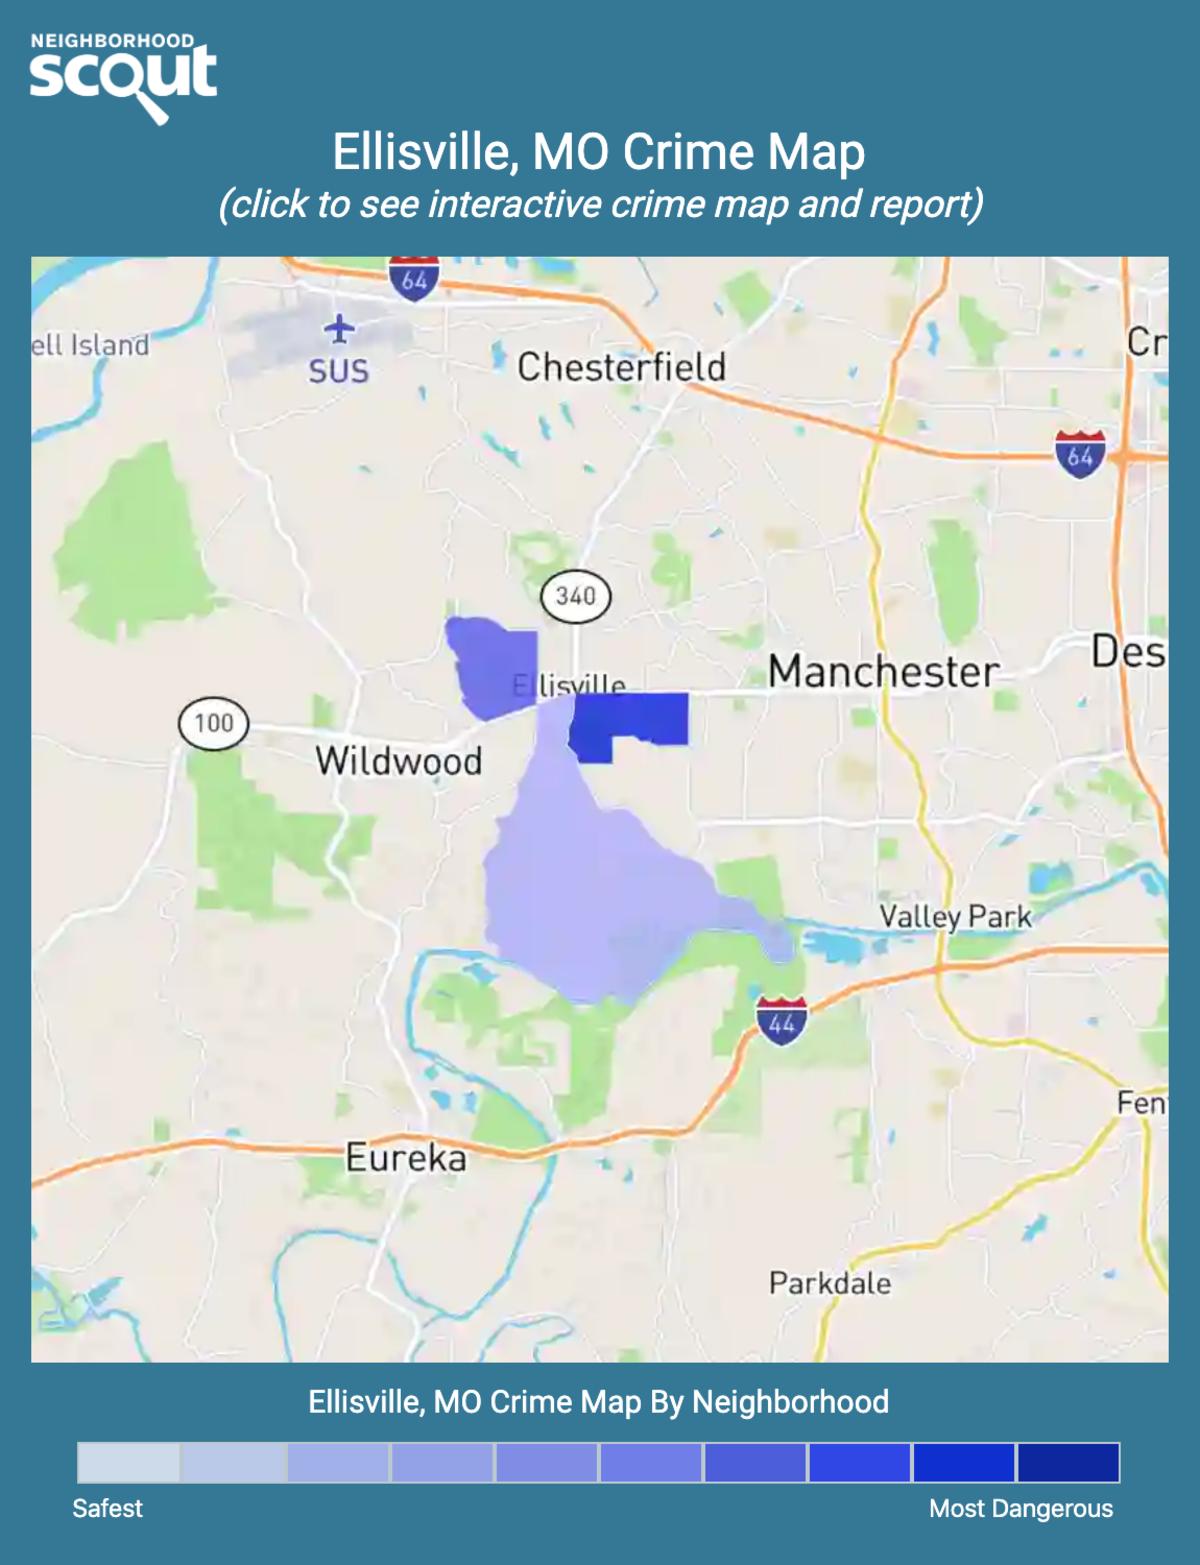 Ellisville, Missouri crime map